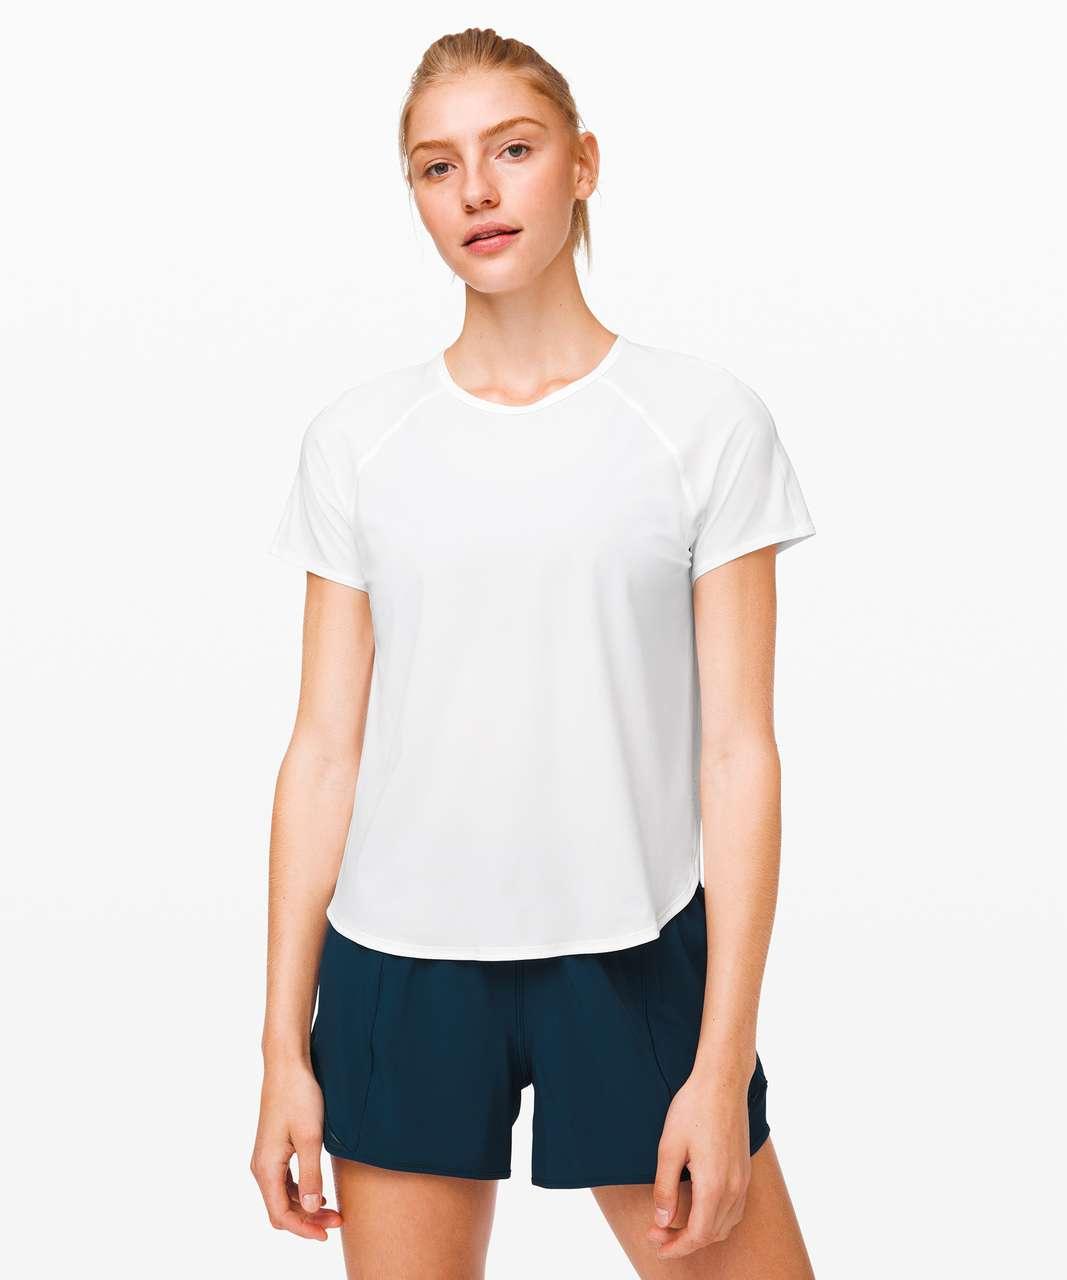 Lululemon Strong Rays Short Sleeve - White